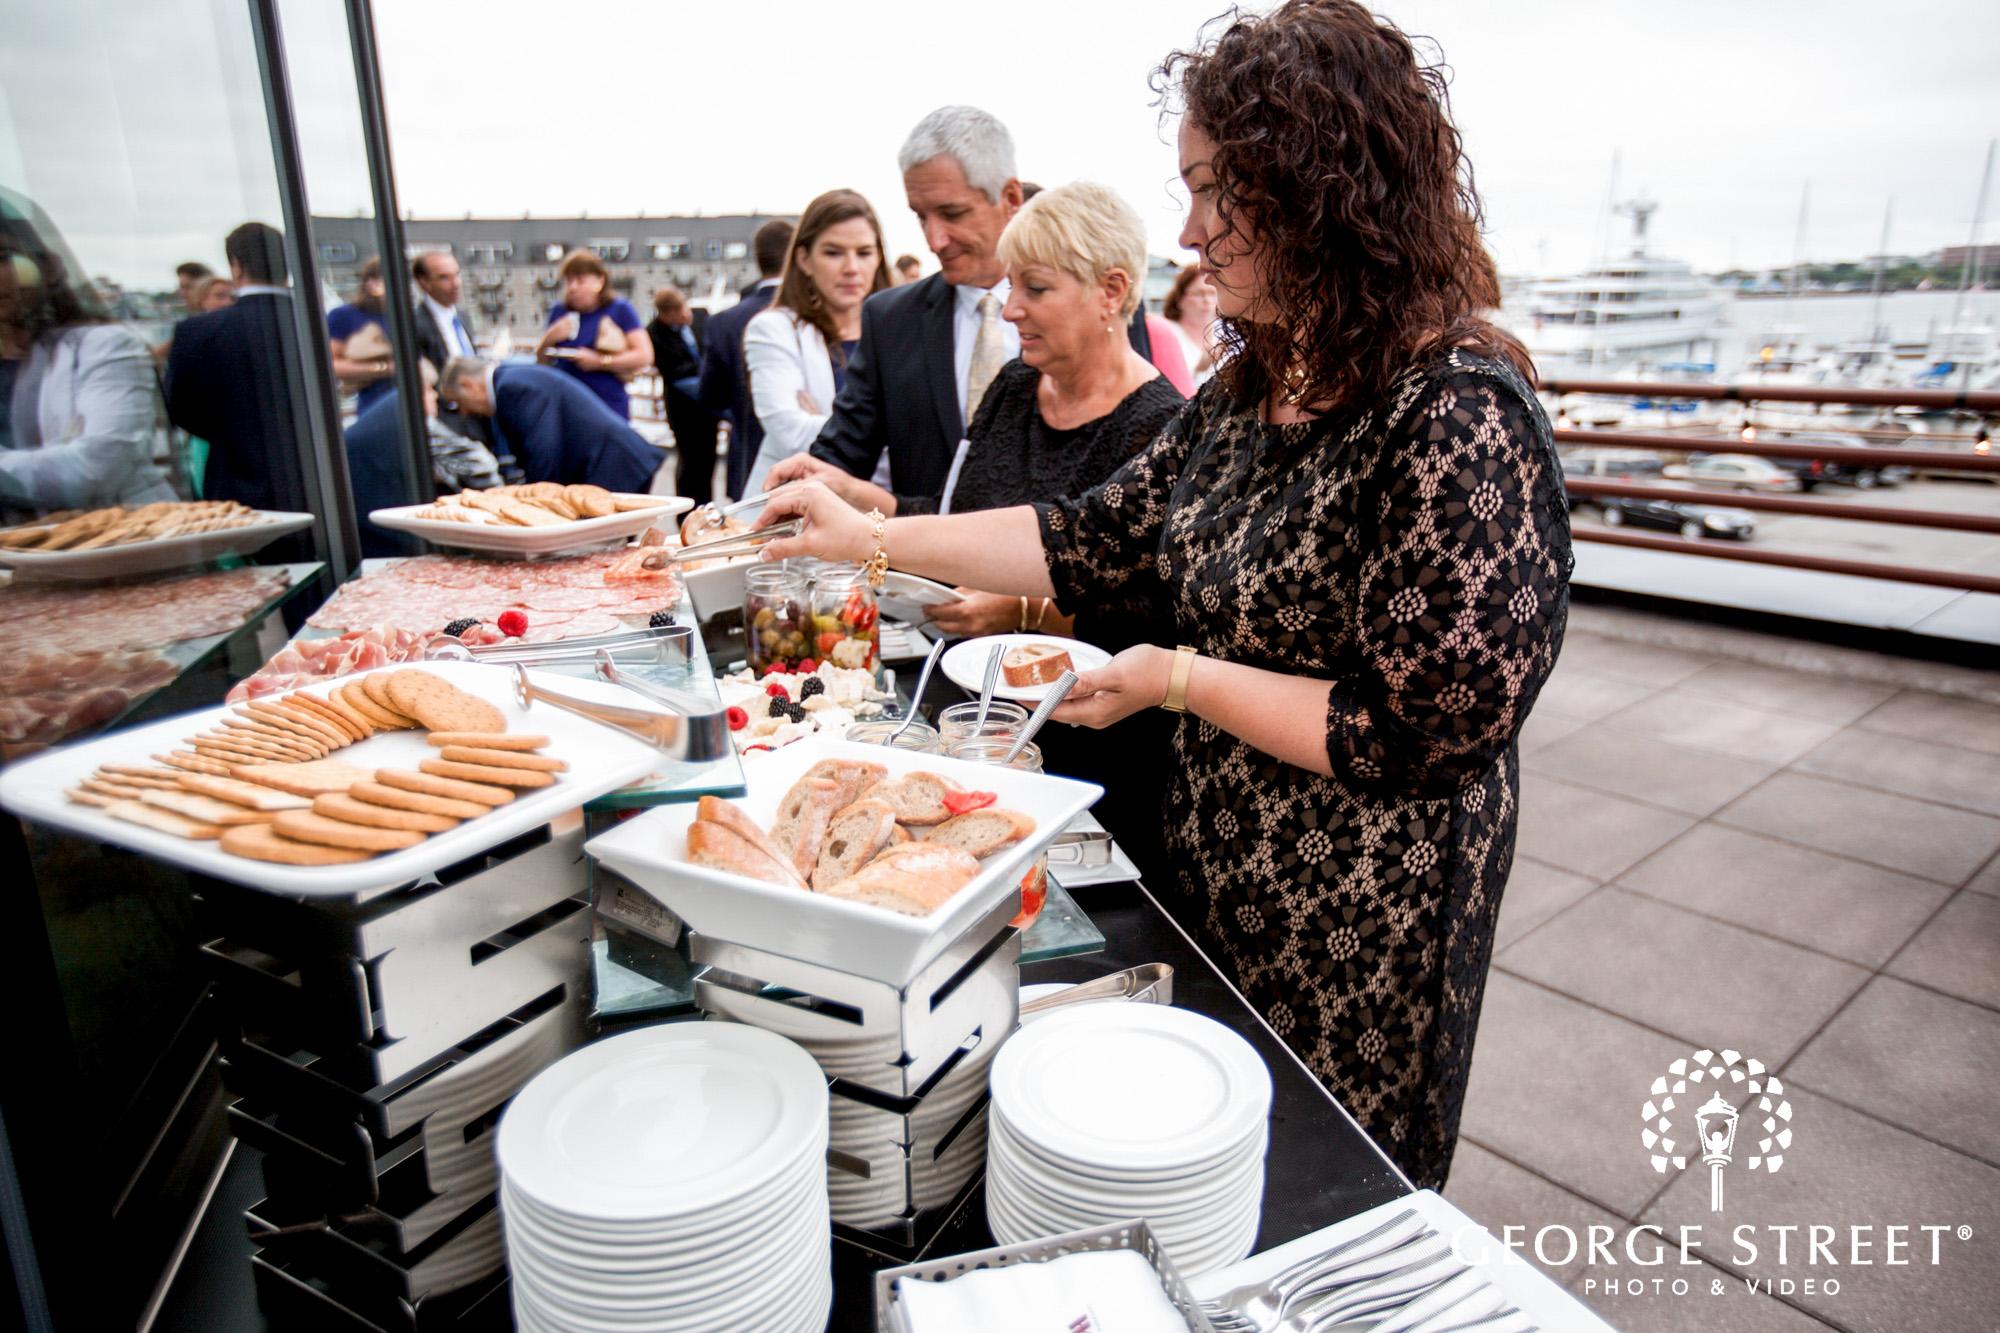 boston marriott long wharf wedding reception outdoor coctail hour